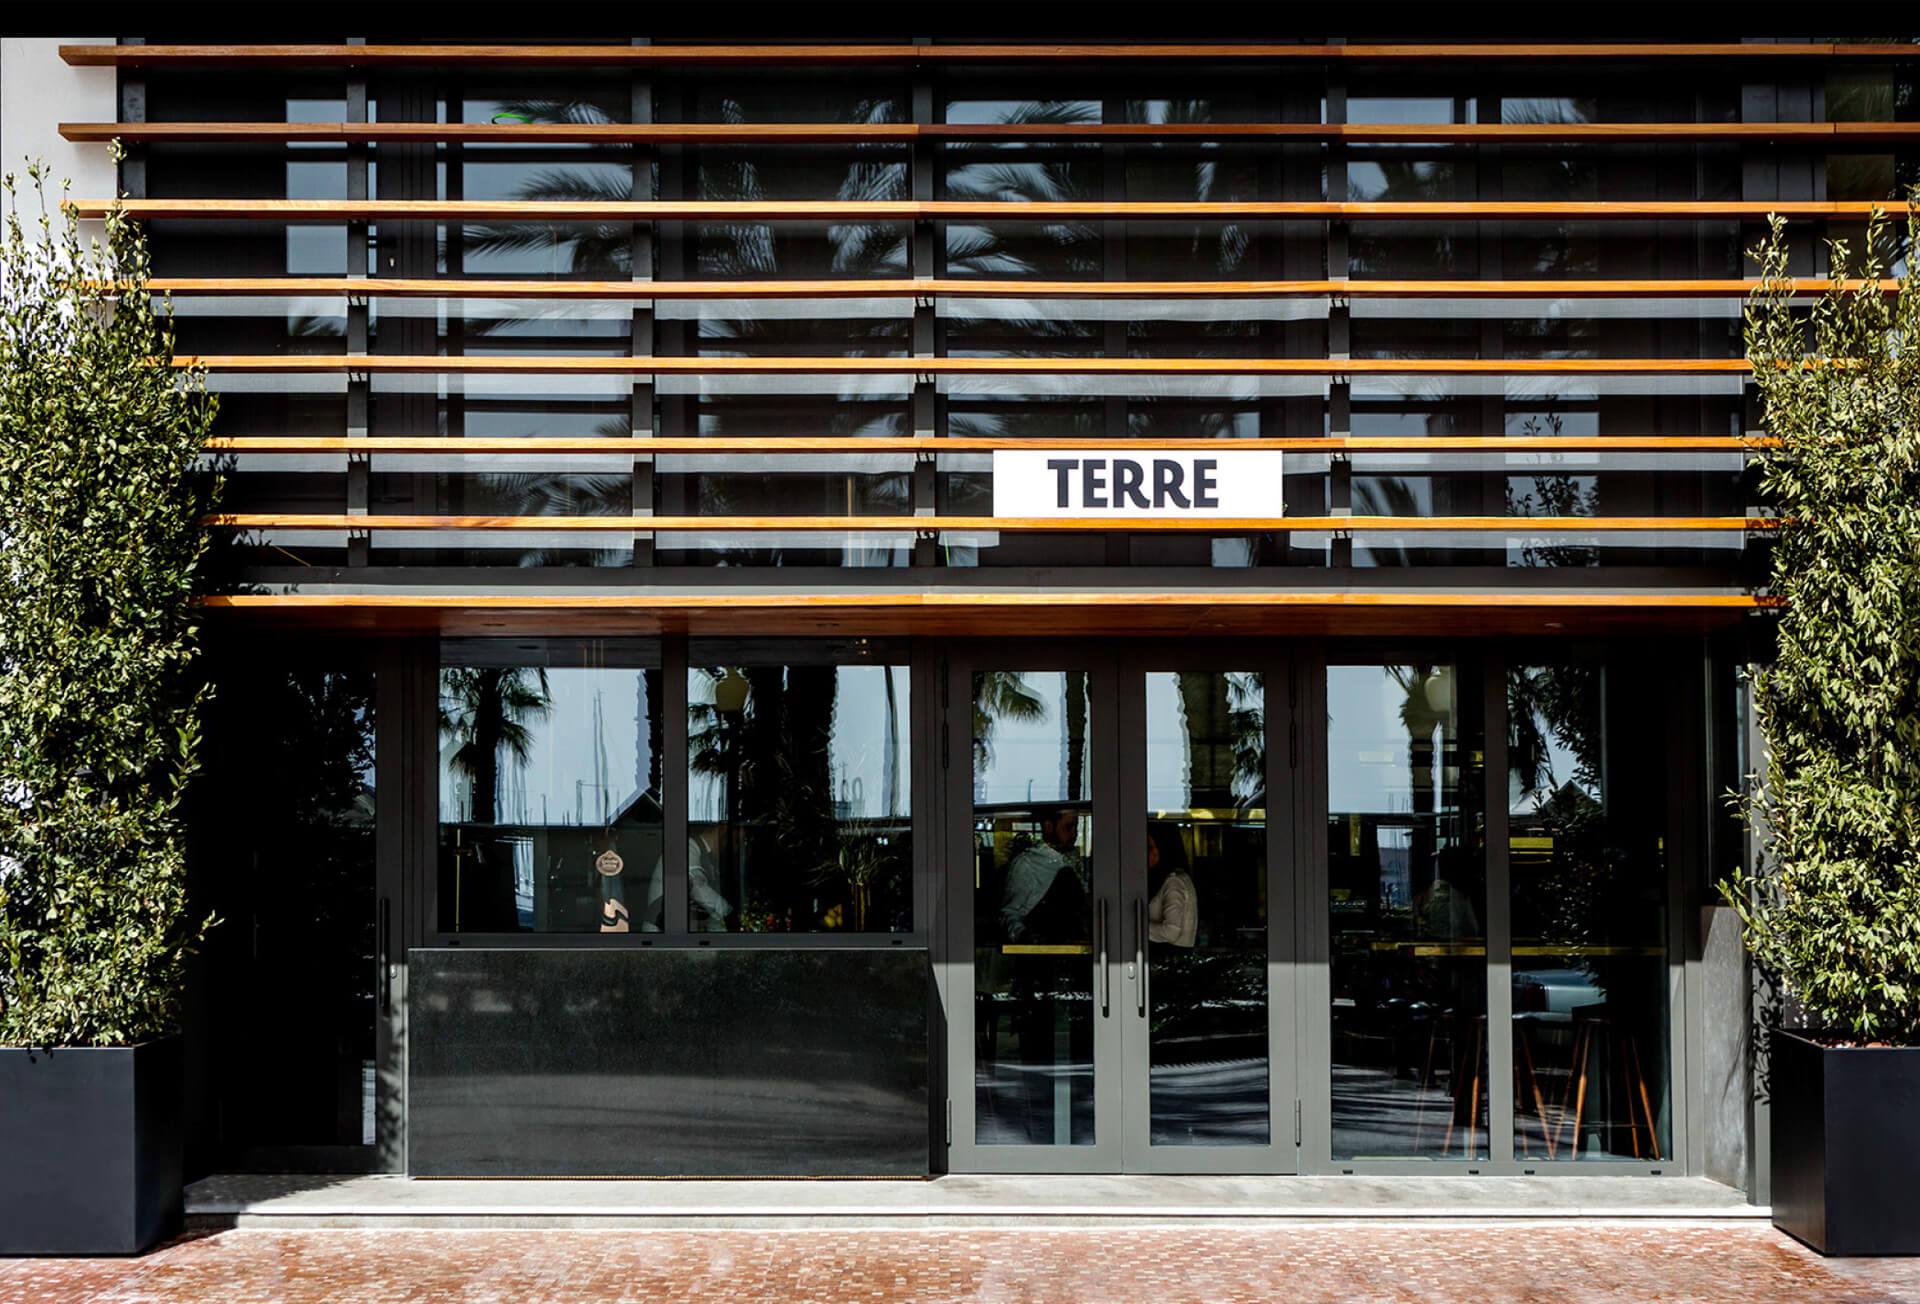 Restaurante Terre | Carpintería Mabima, Alicante